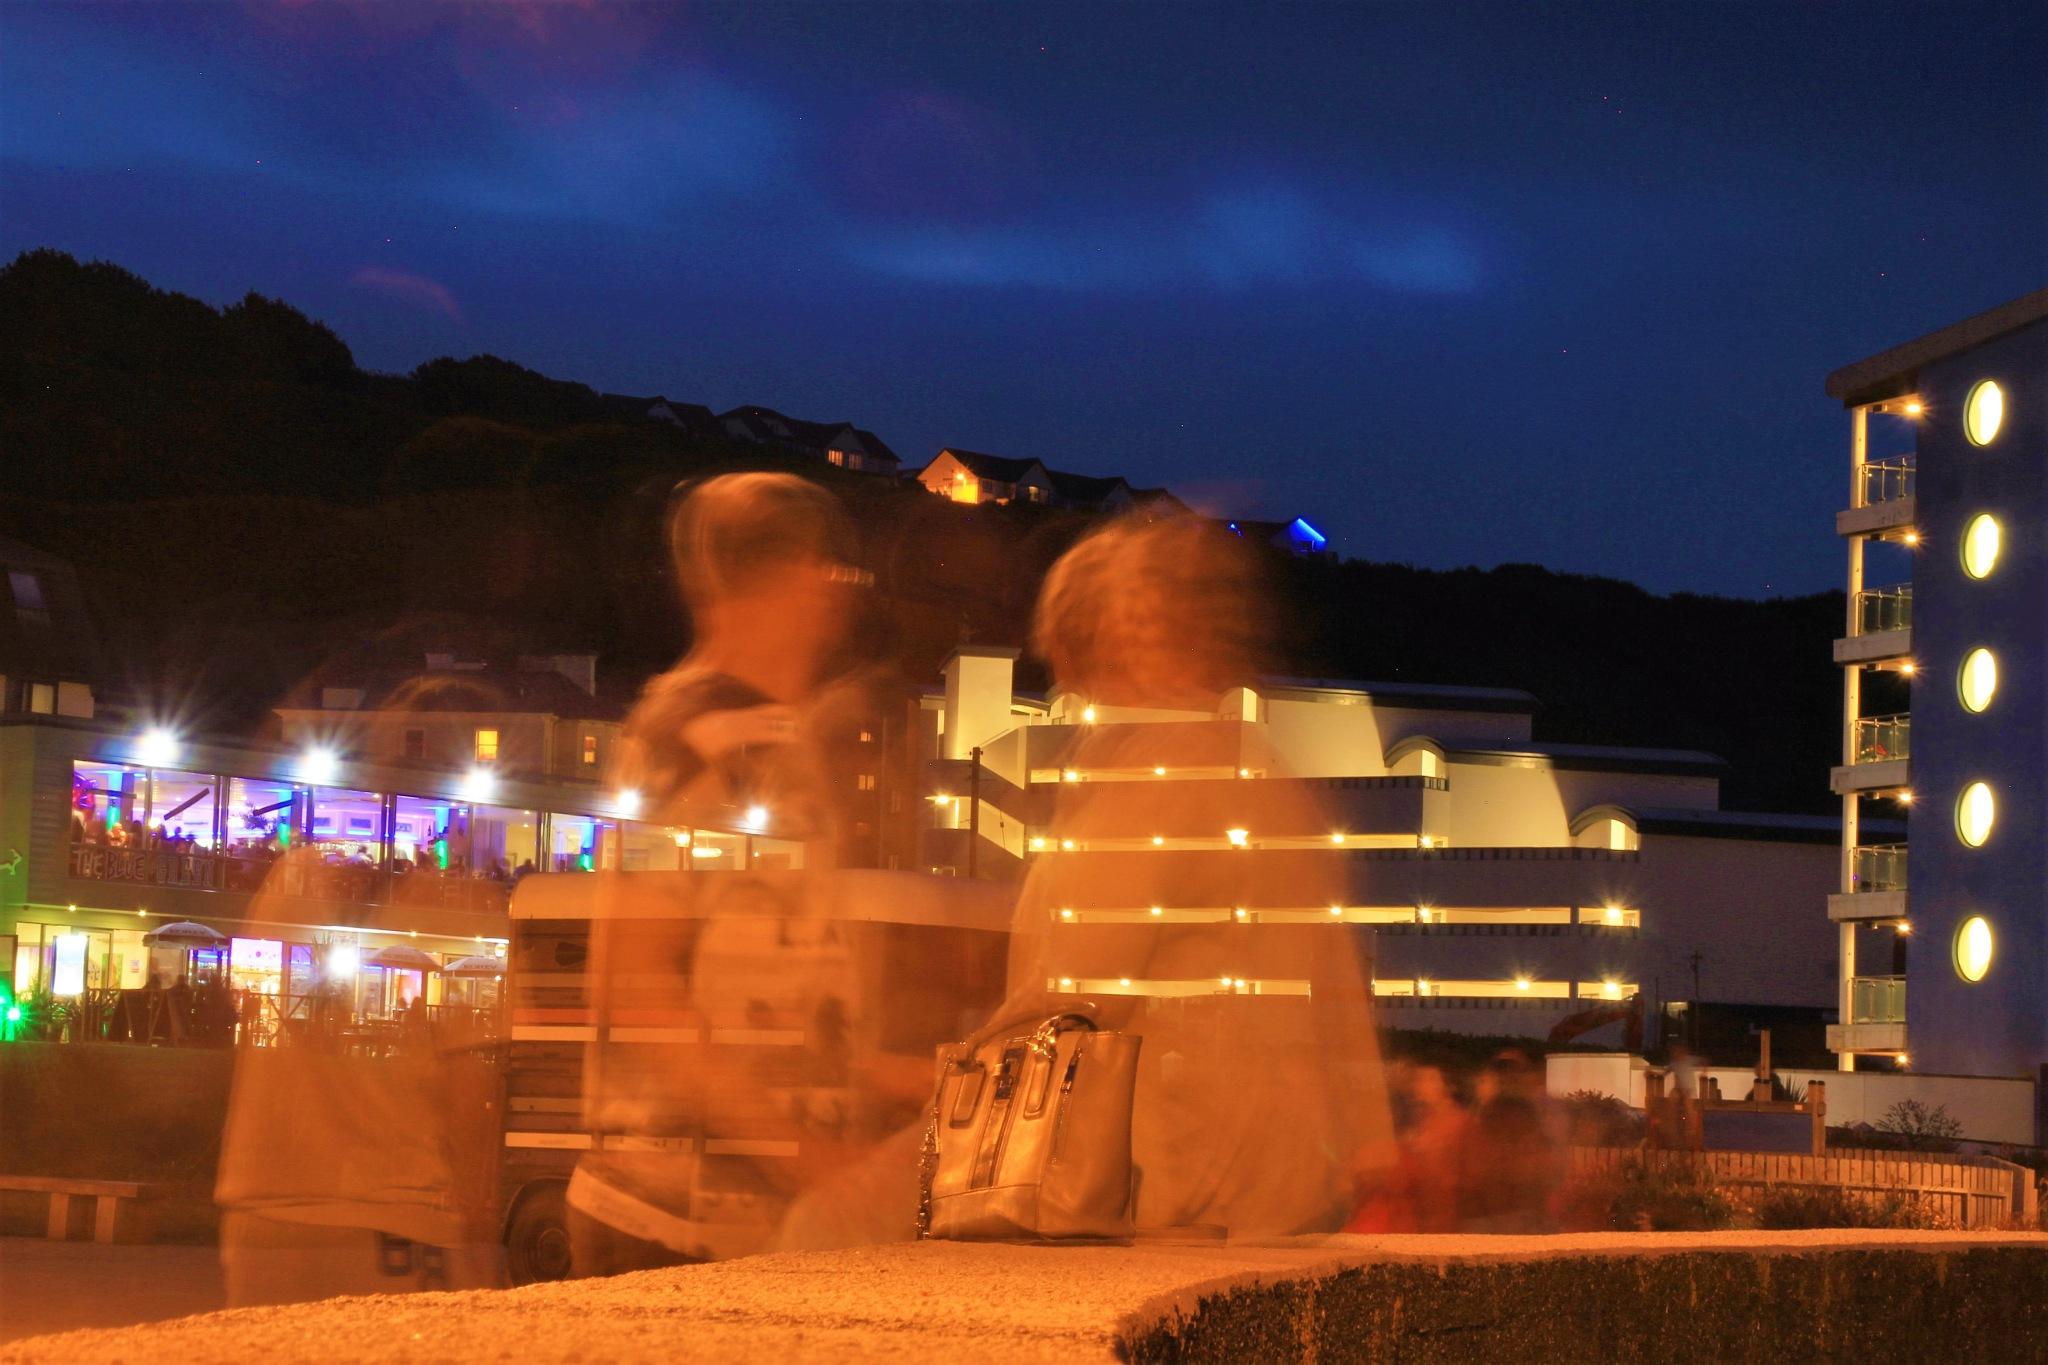 Ghosts night out, Westward Ho! by alijhawkins